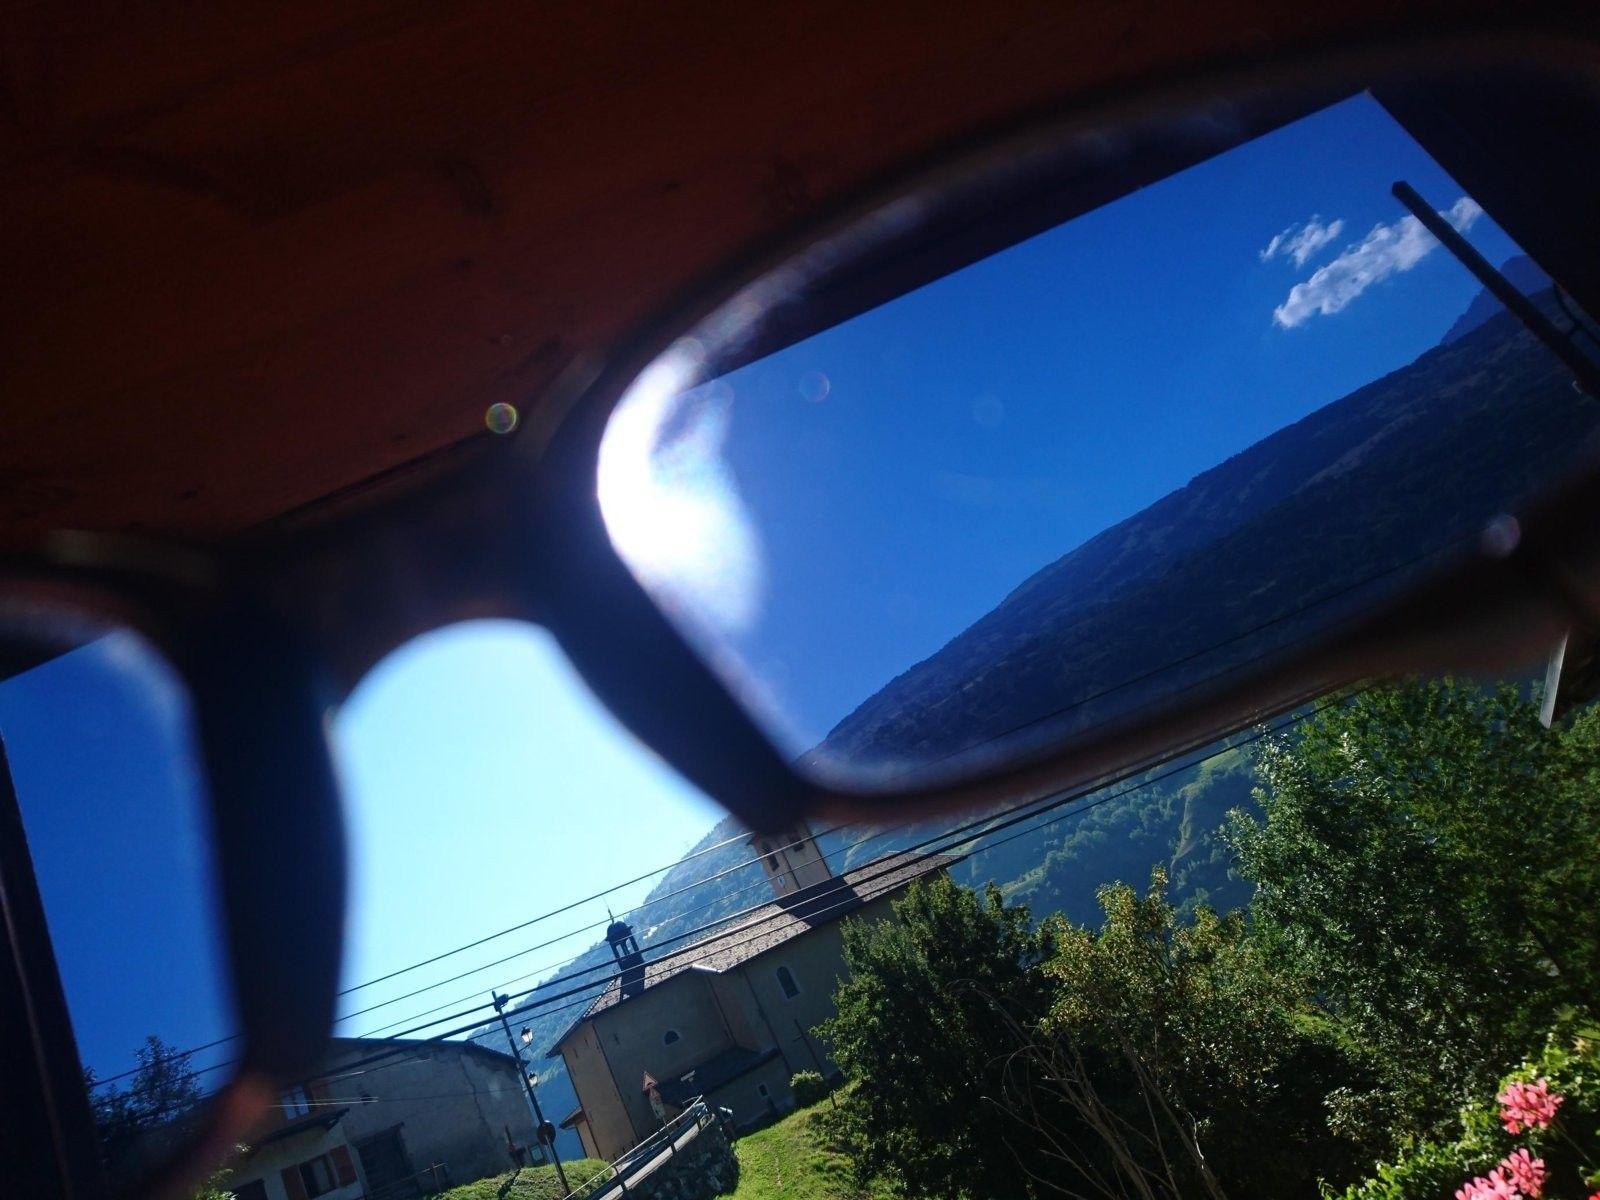 Lens condition pics - image.jpeg